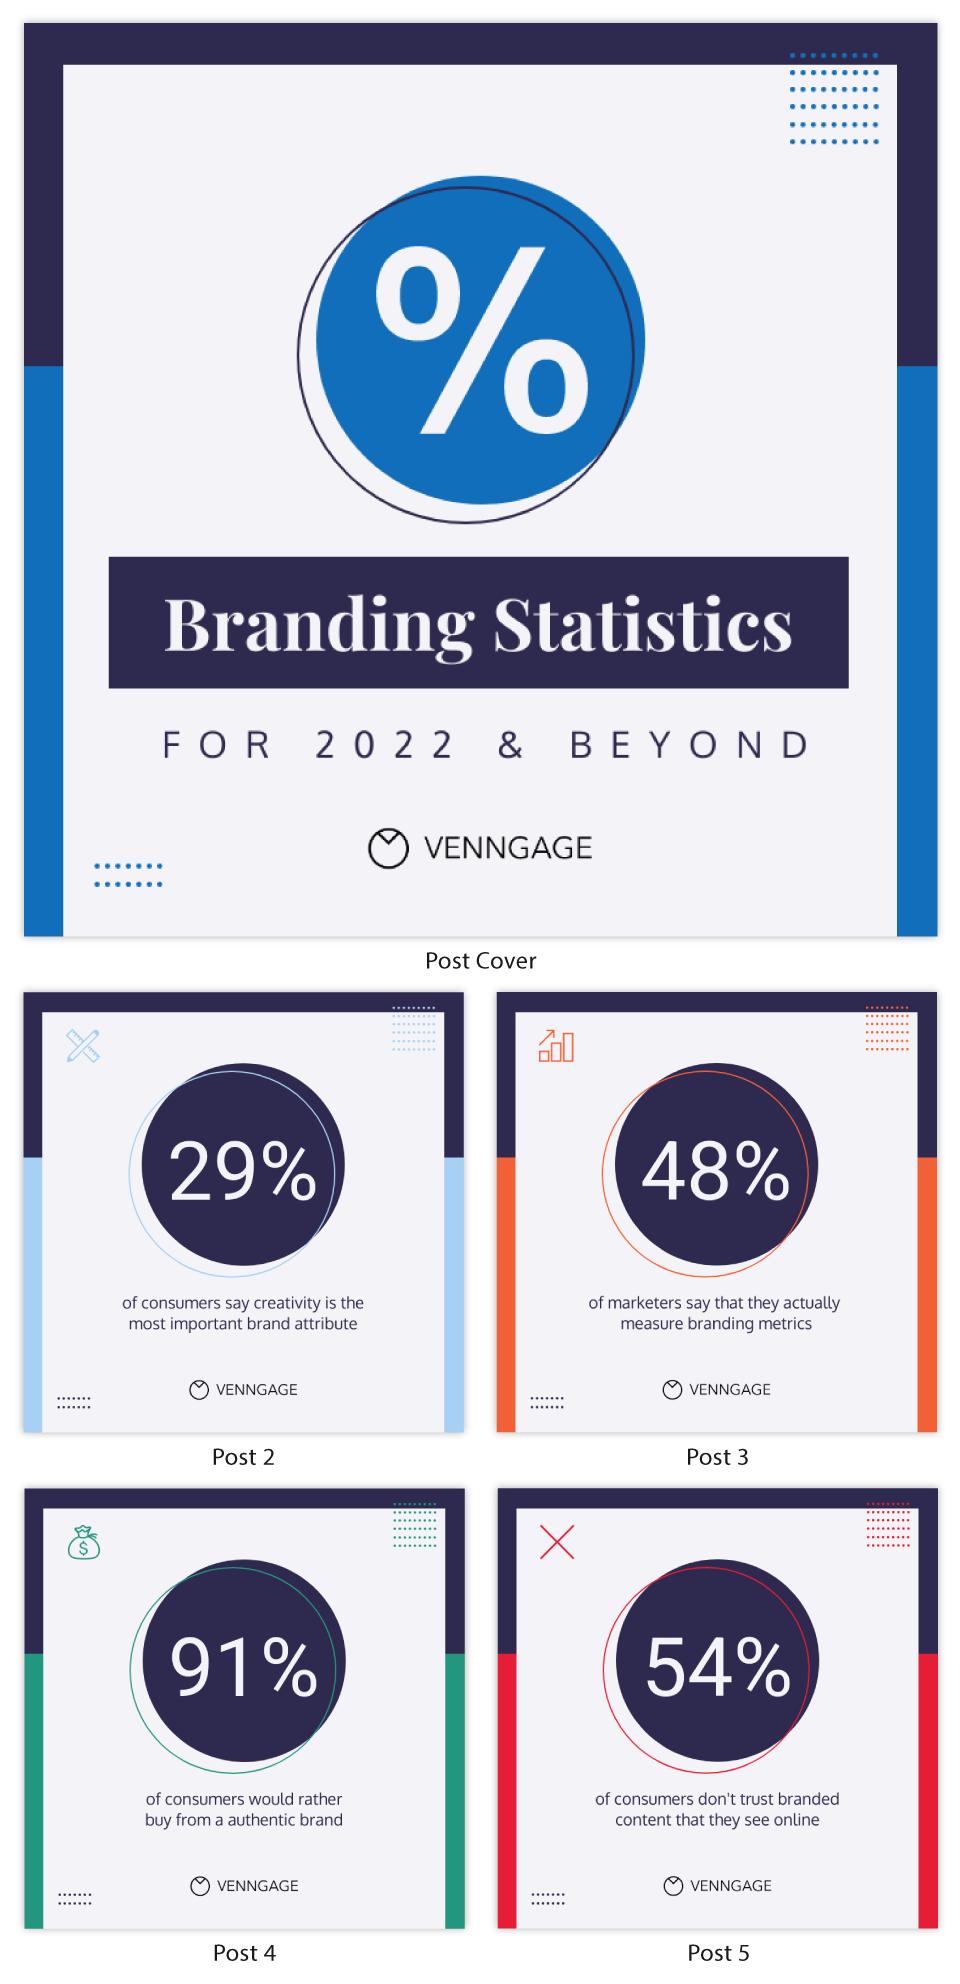 Branding Statistics Instagram Carousel Post Template